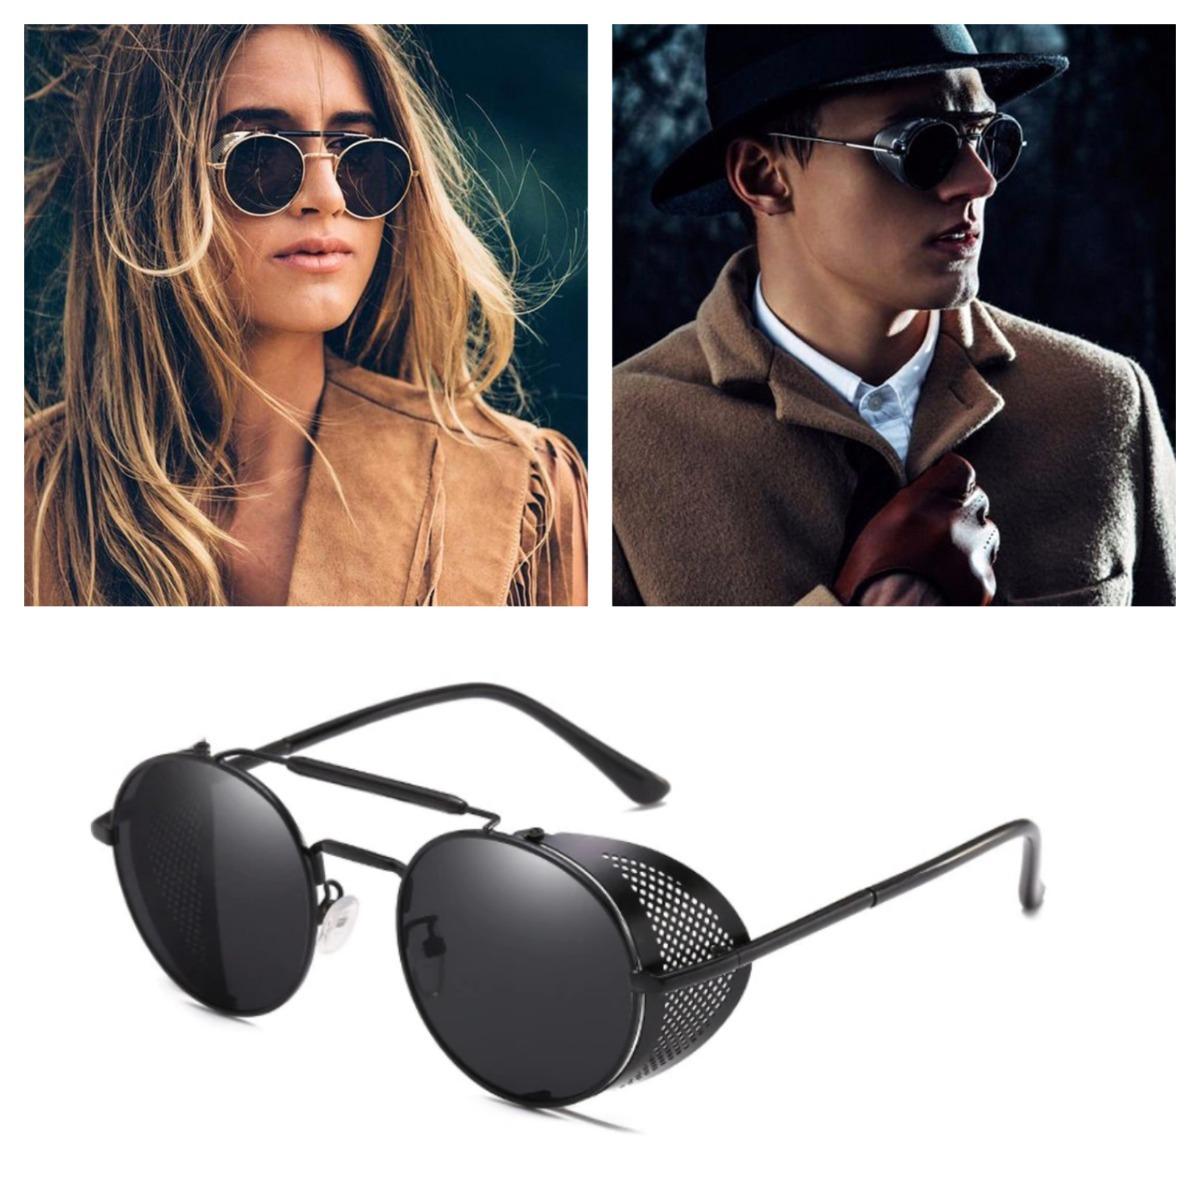 15c998a4cf lentes gafas de sol steampunk redondos negros matsuda metal. Cargando zoom.